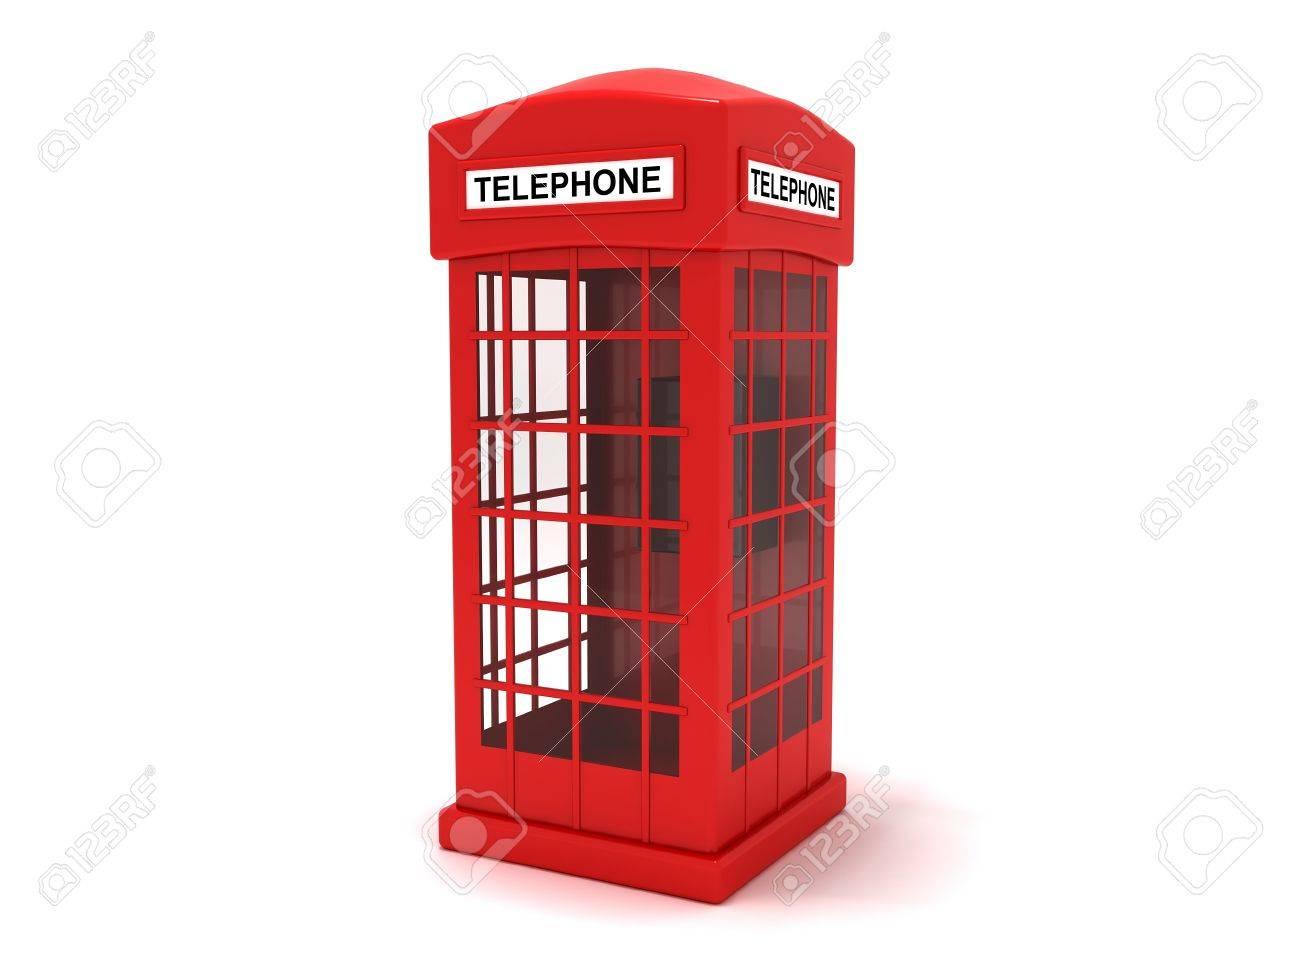 Telephone booth Stock Photo - 13343767